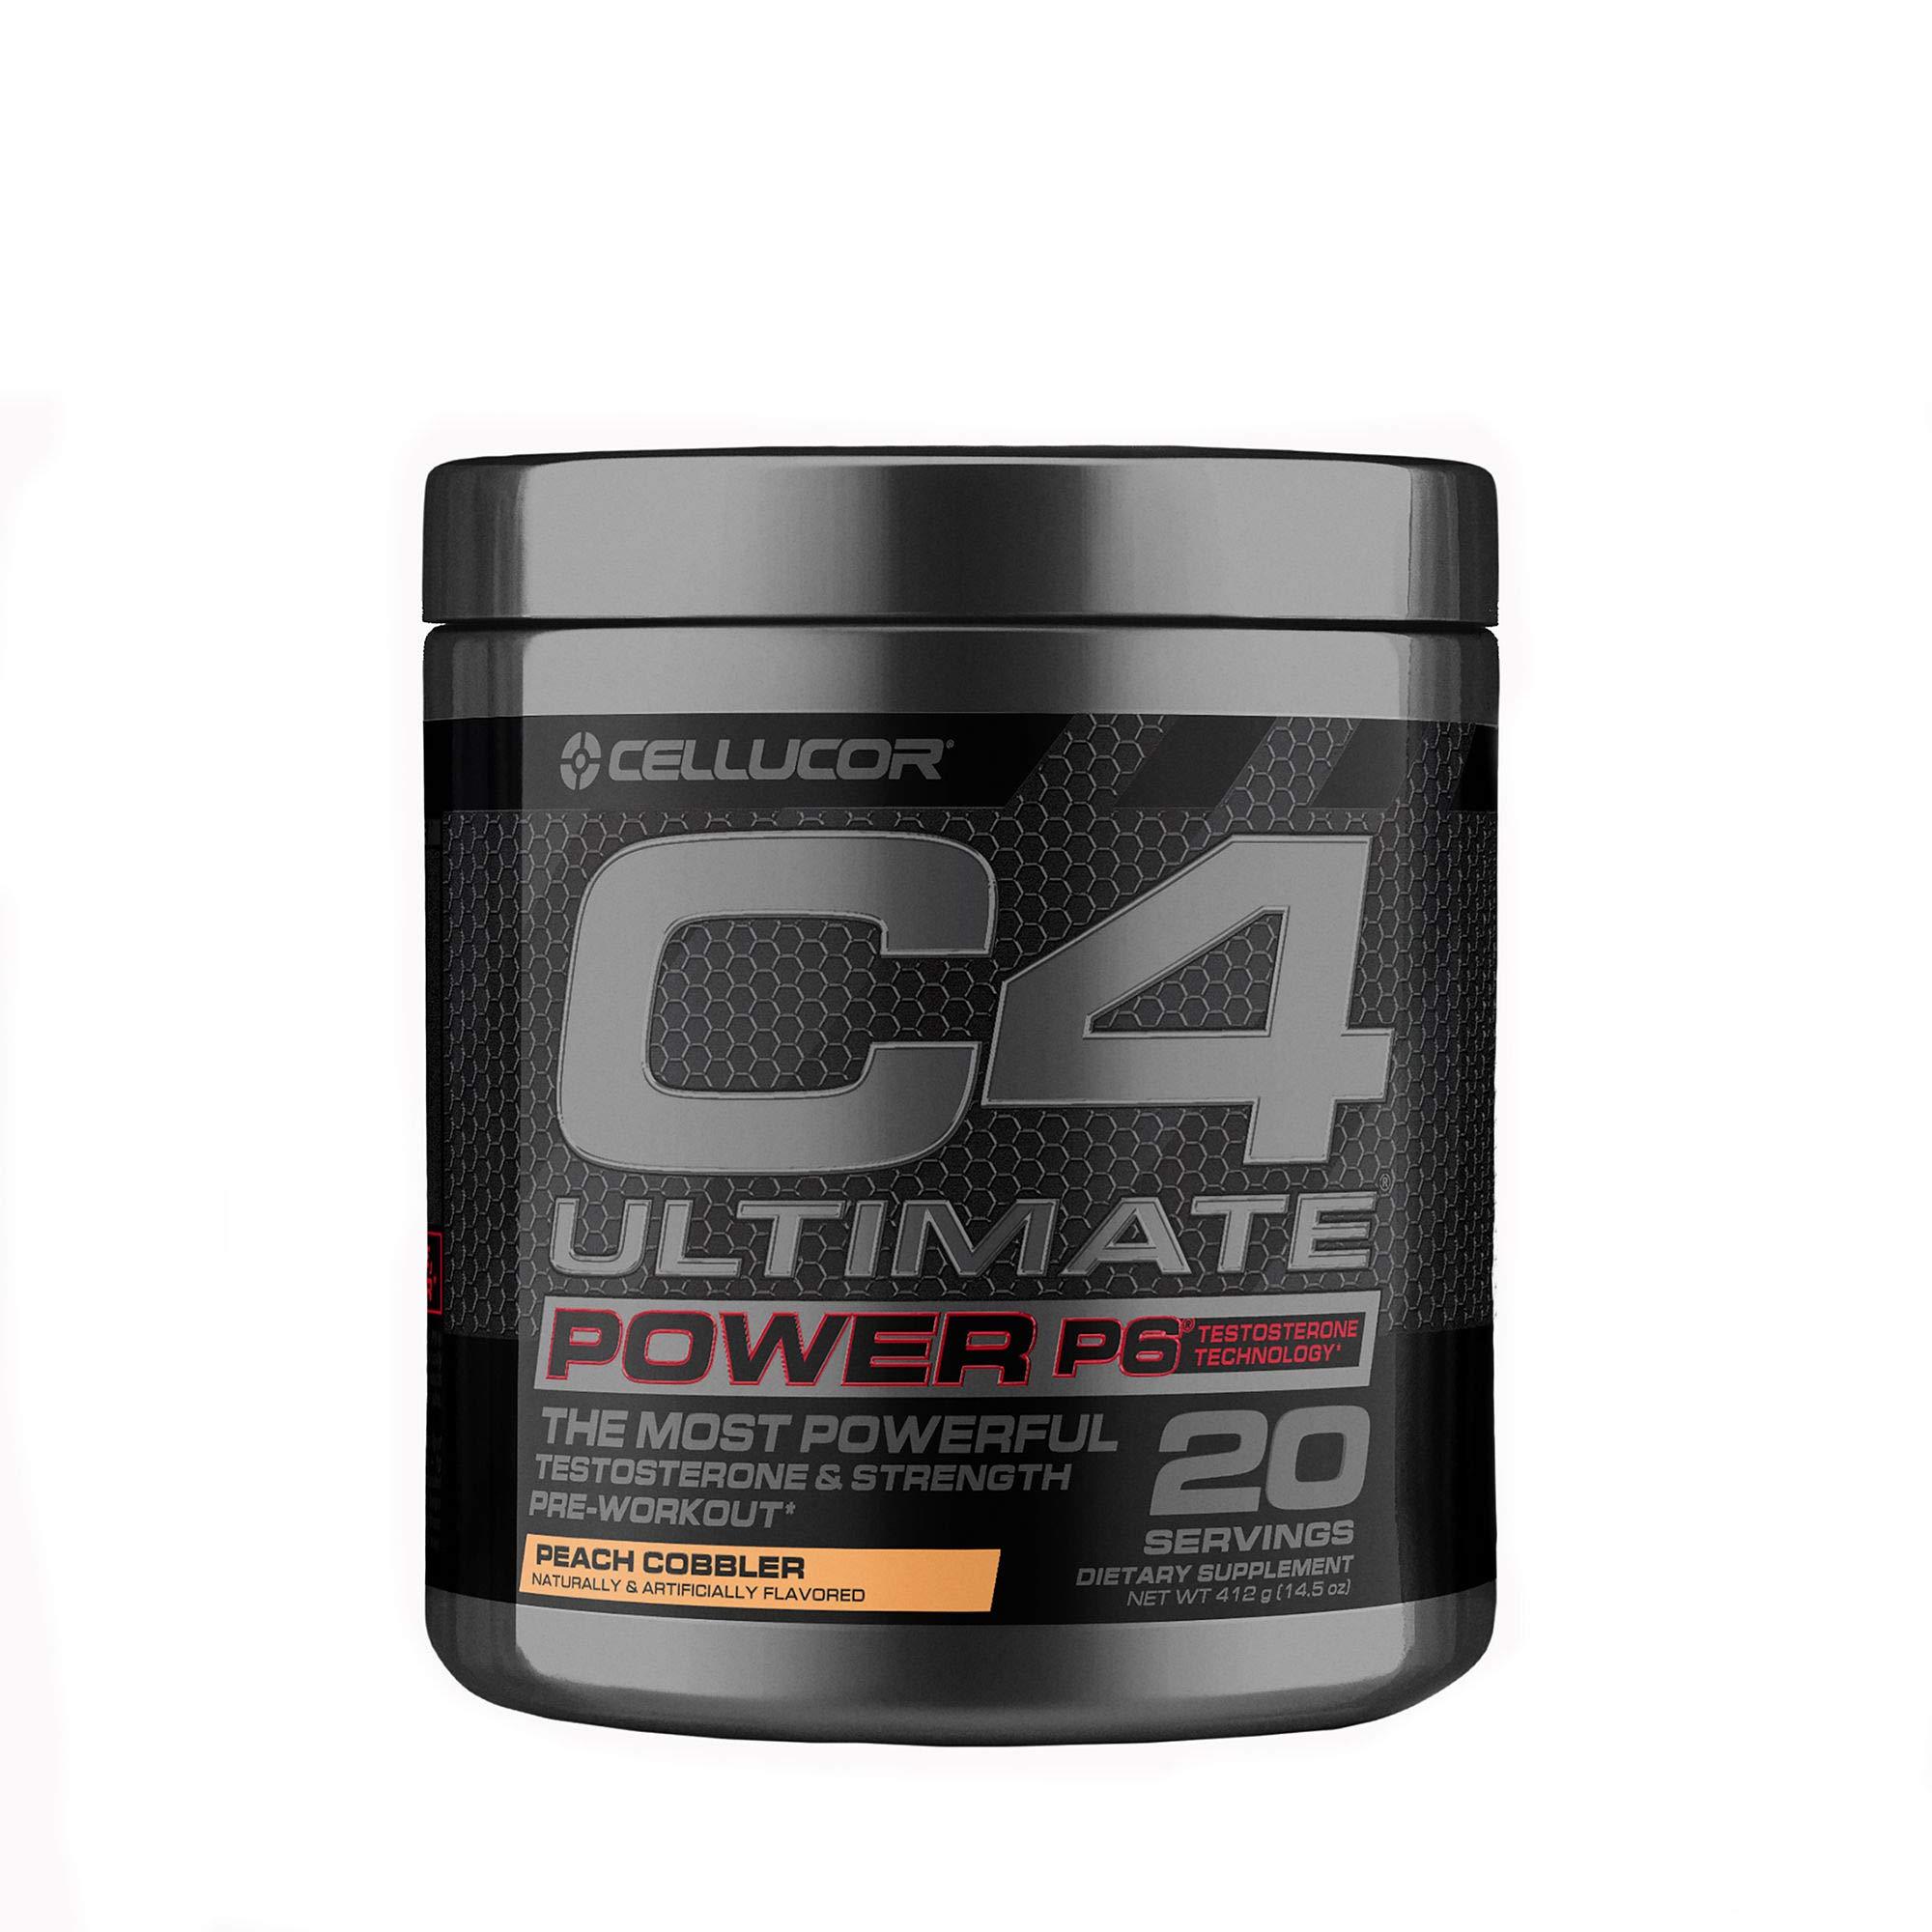 Cellucor C4 Ultimate Power P6 - Peach Cobbler